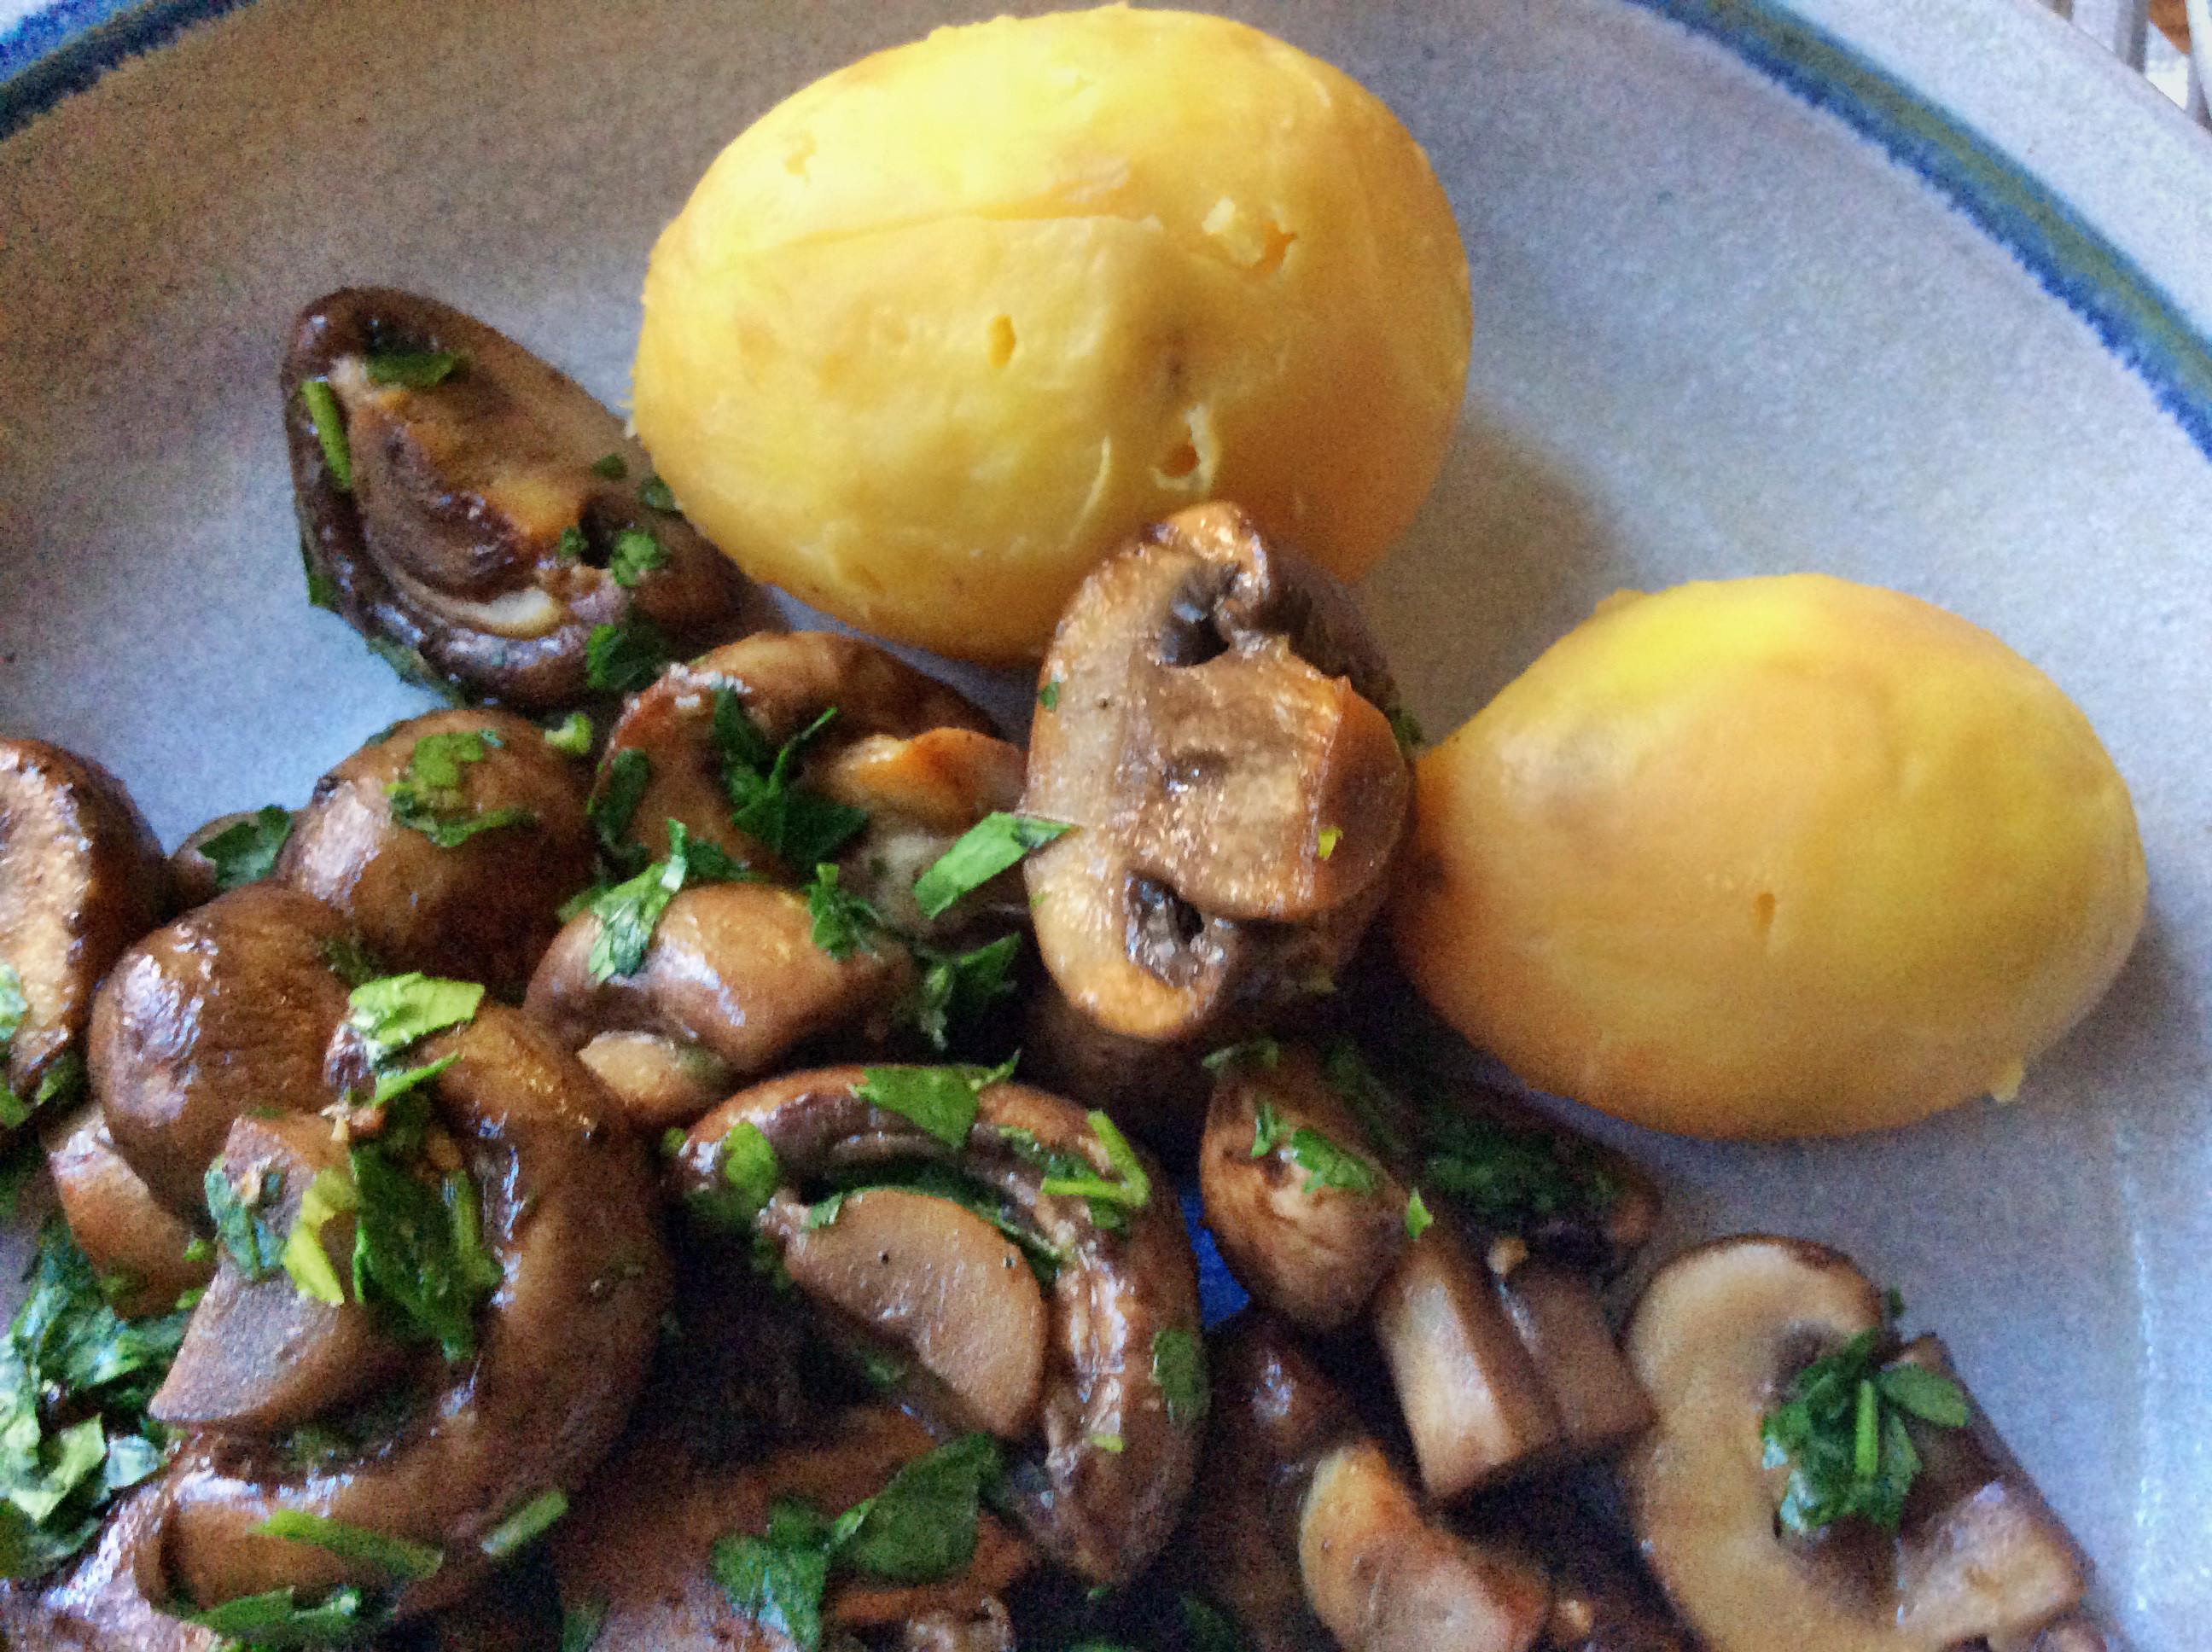 Champignon,Kartoffeln,Dessert -16.11.15   (9)